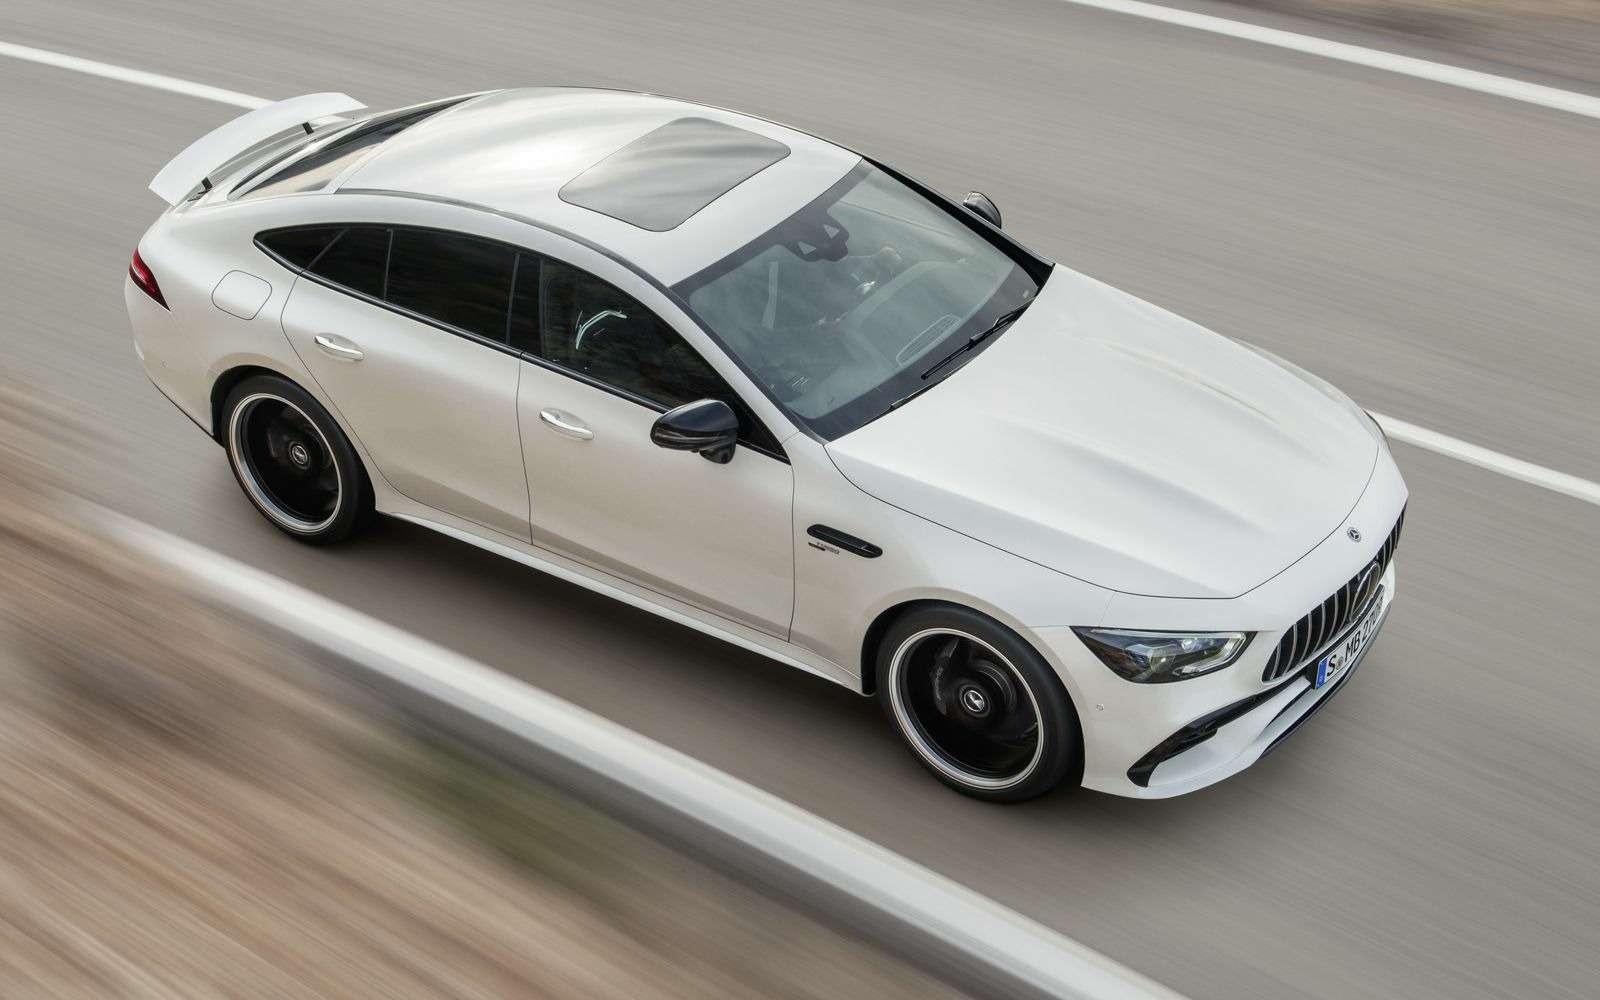 Подмена! Пятидверный Mercedes-AMG GTполучил «тележку» Е-класса— фото 851538